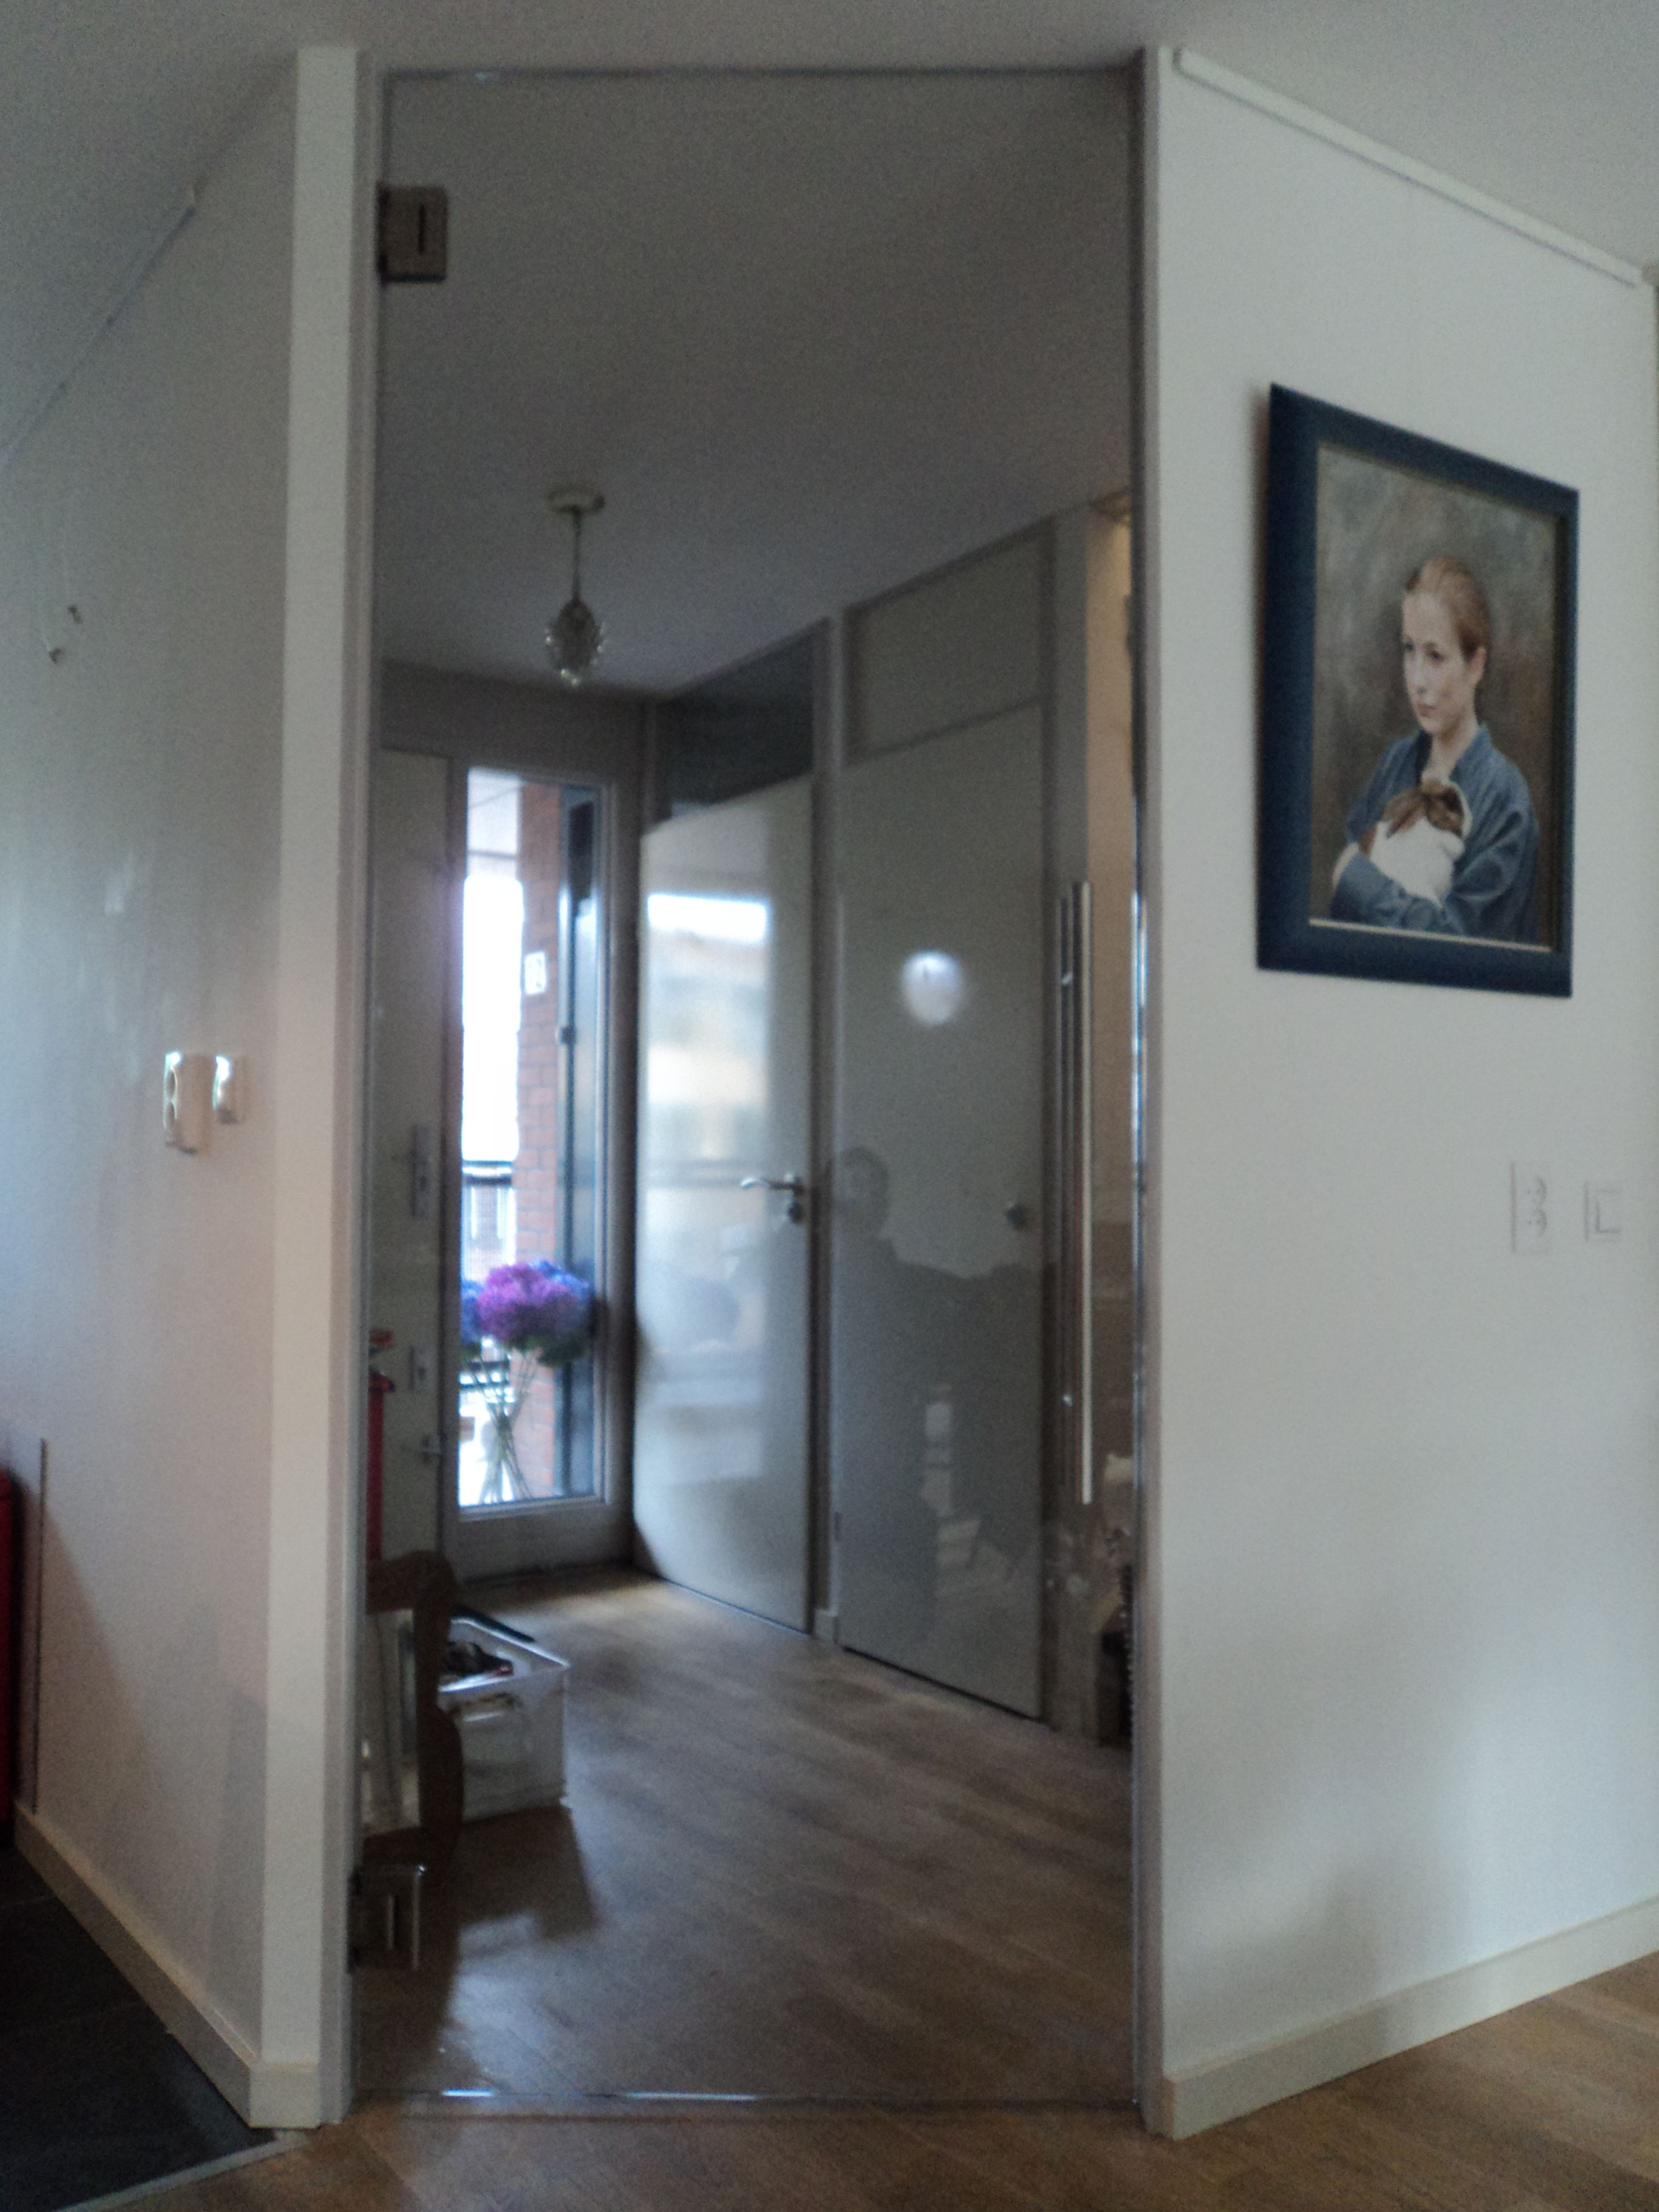 https://www.glashandelariba.nl/wp-content/uploads/2016/11/volglazen-deur-den-haag.jpg